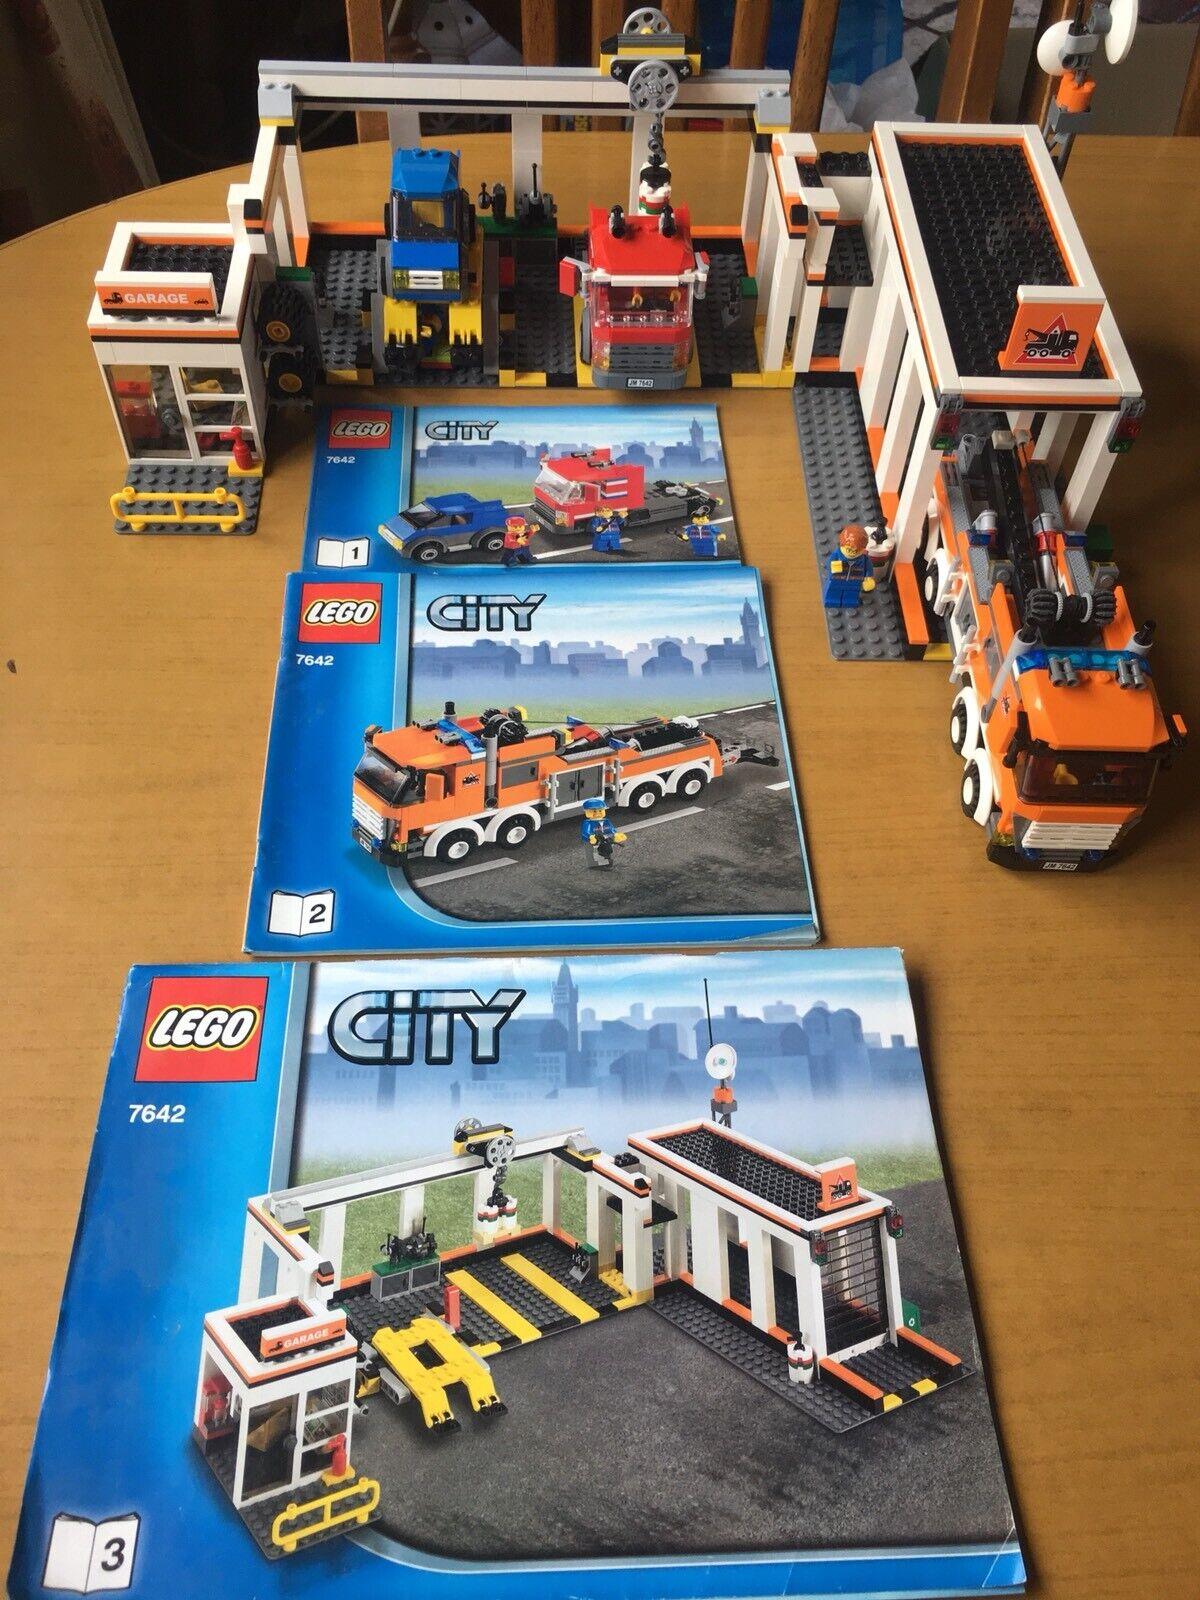 Lego City (7642) Garage, Excellent Condition